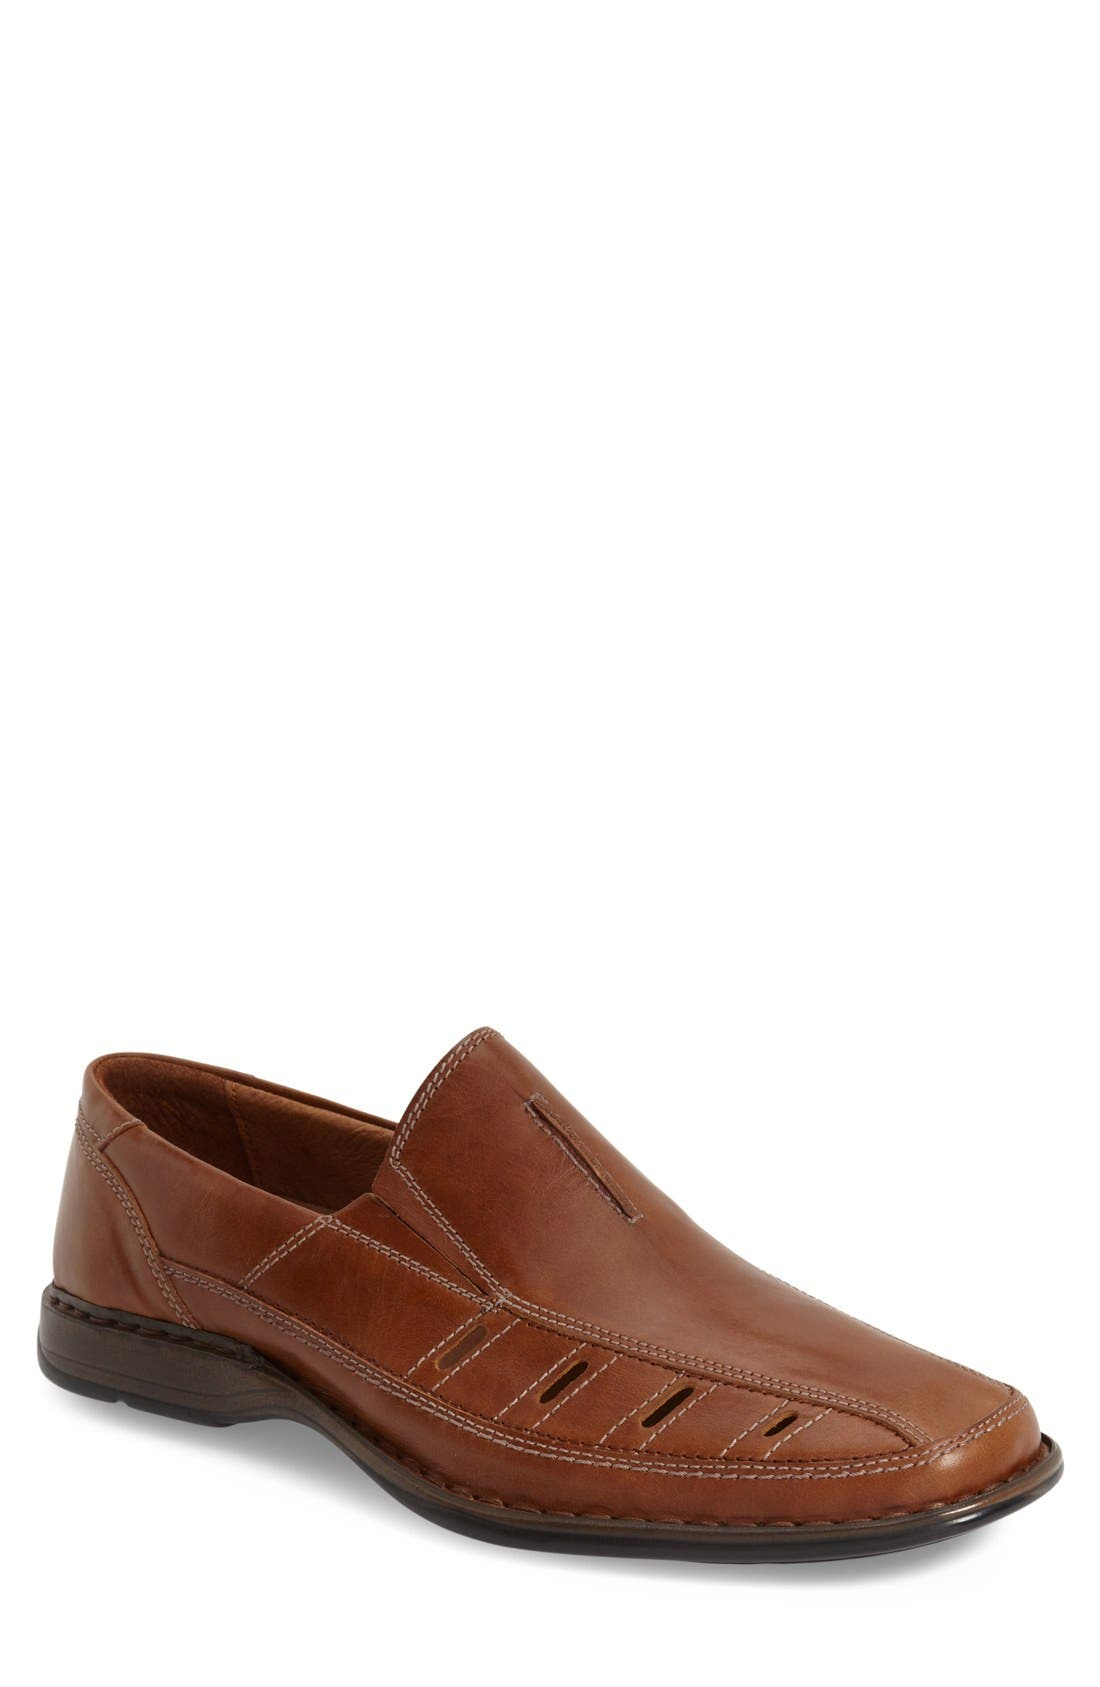 'Steven' Slip On,                         Main,                         color, Nuss Roma Brown Leather